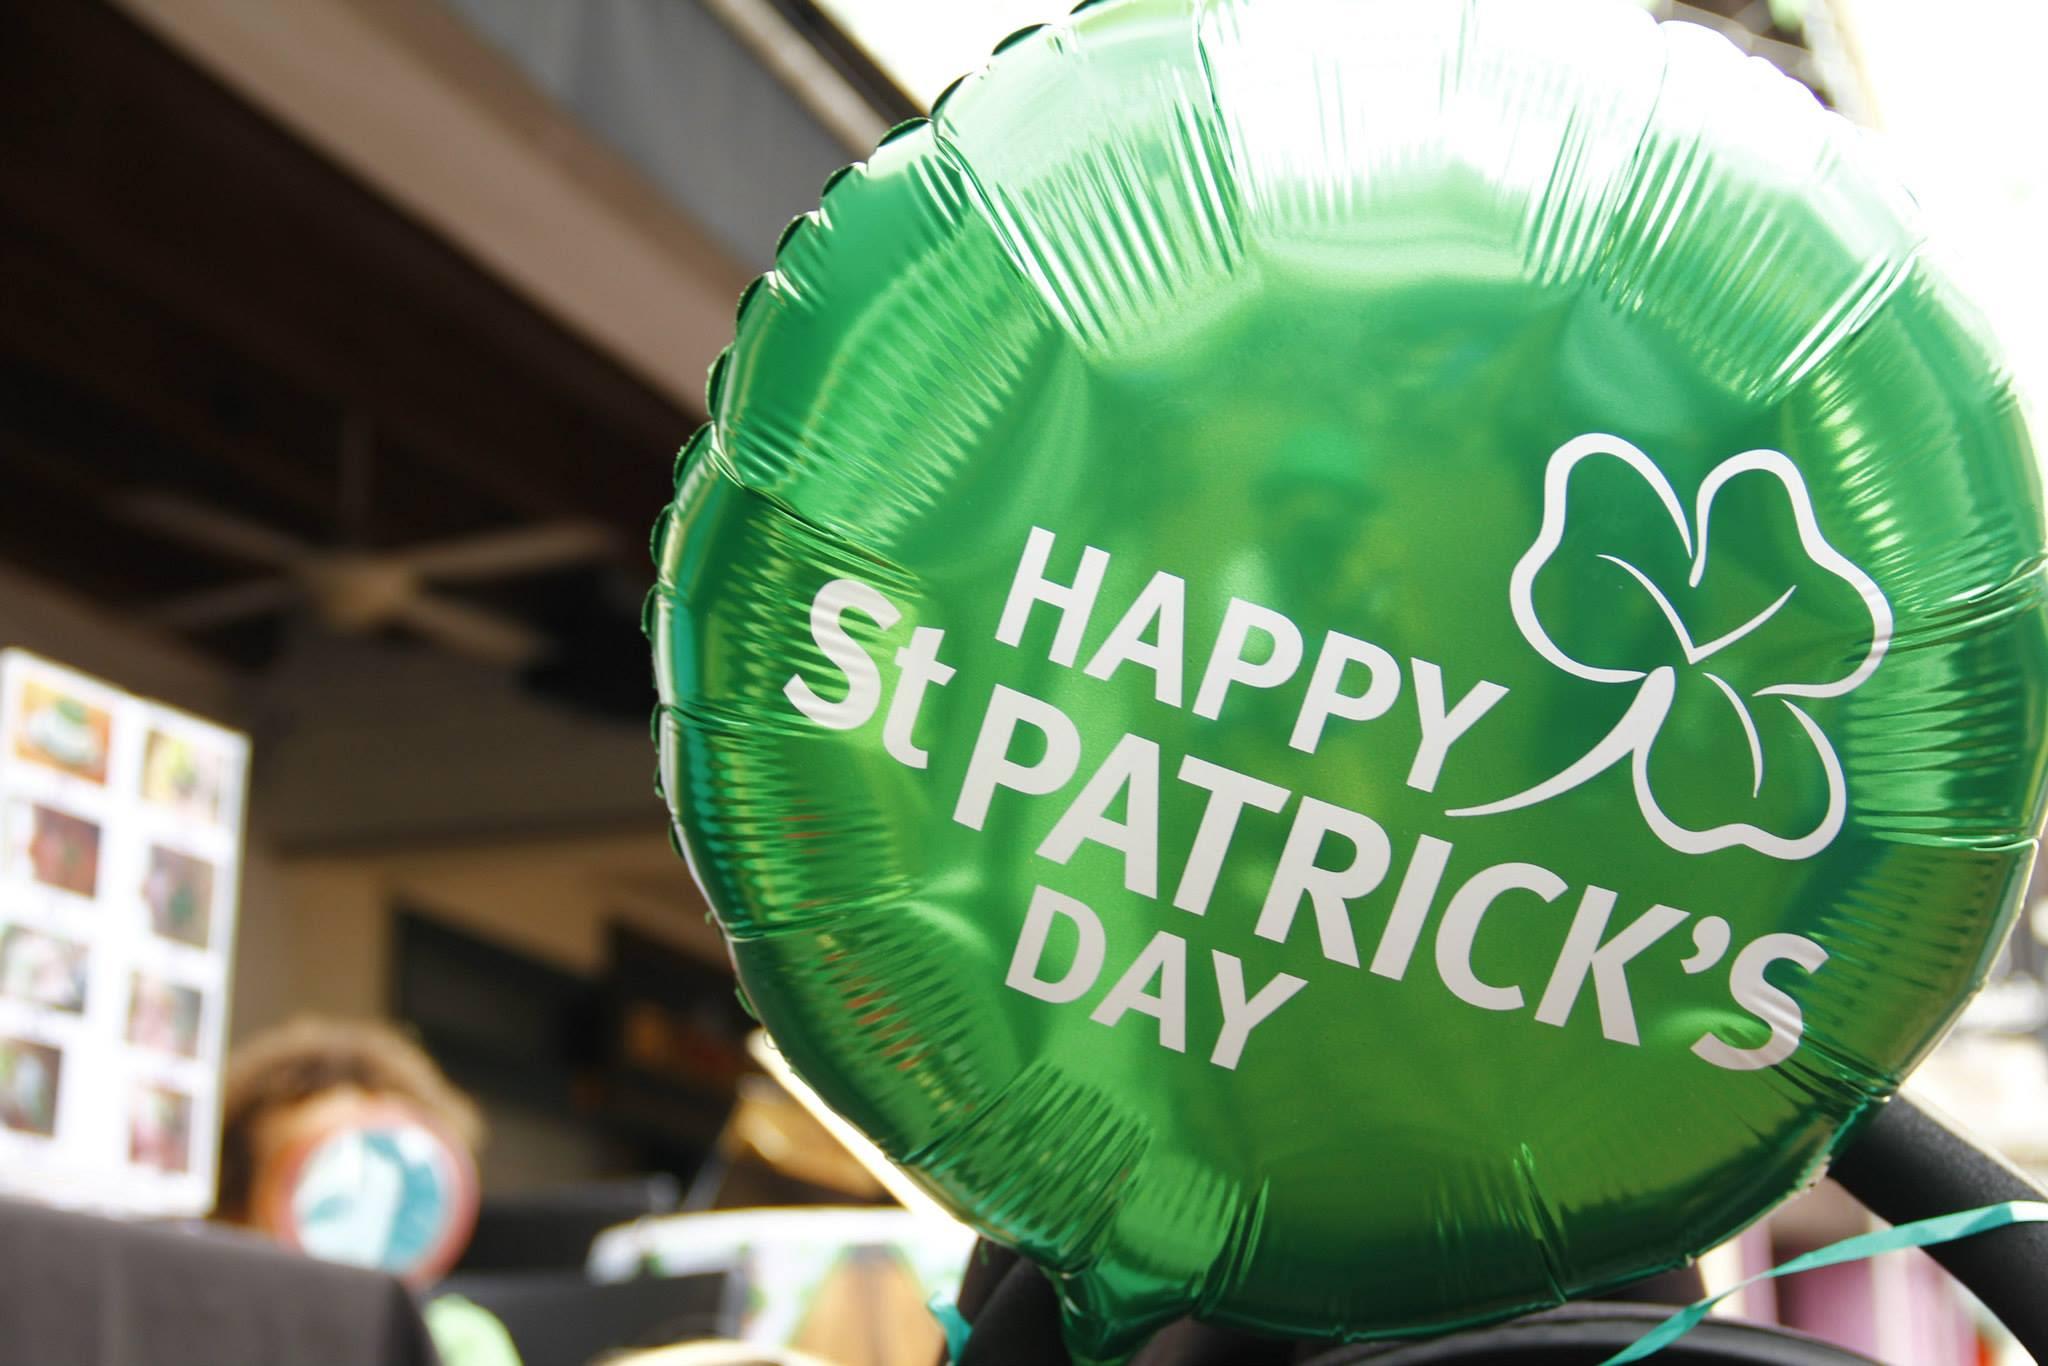 Happy st. patrick s day u8yfgc